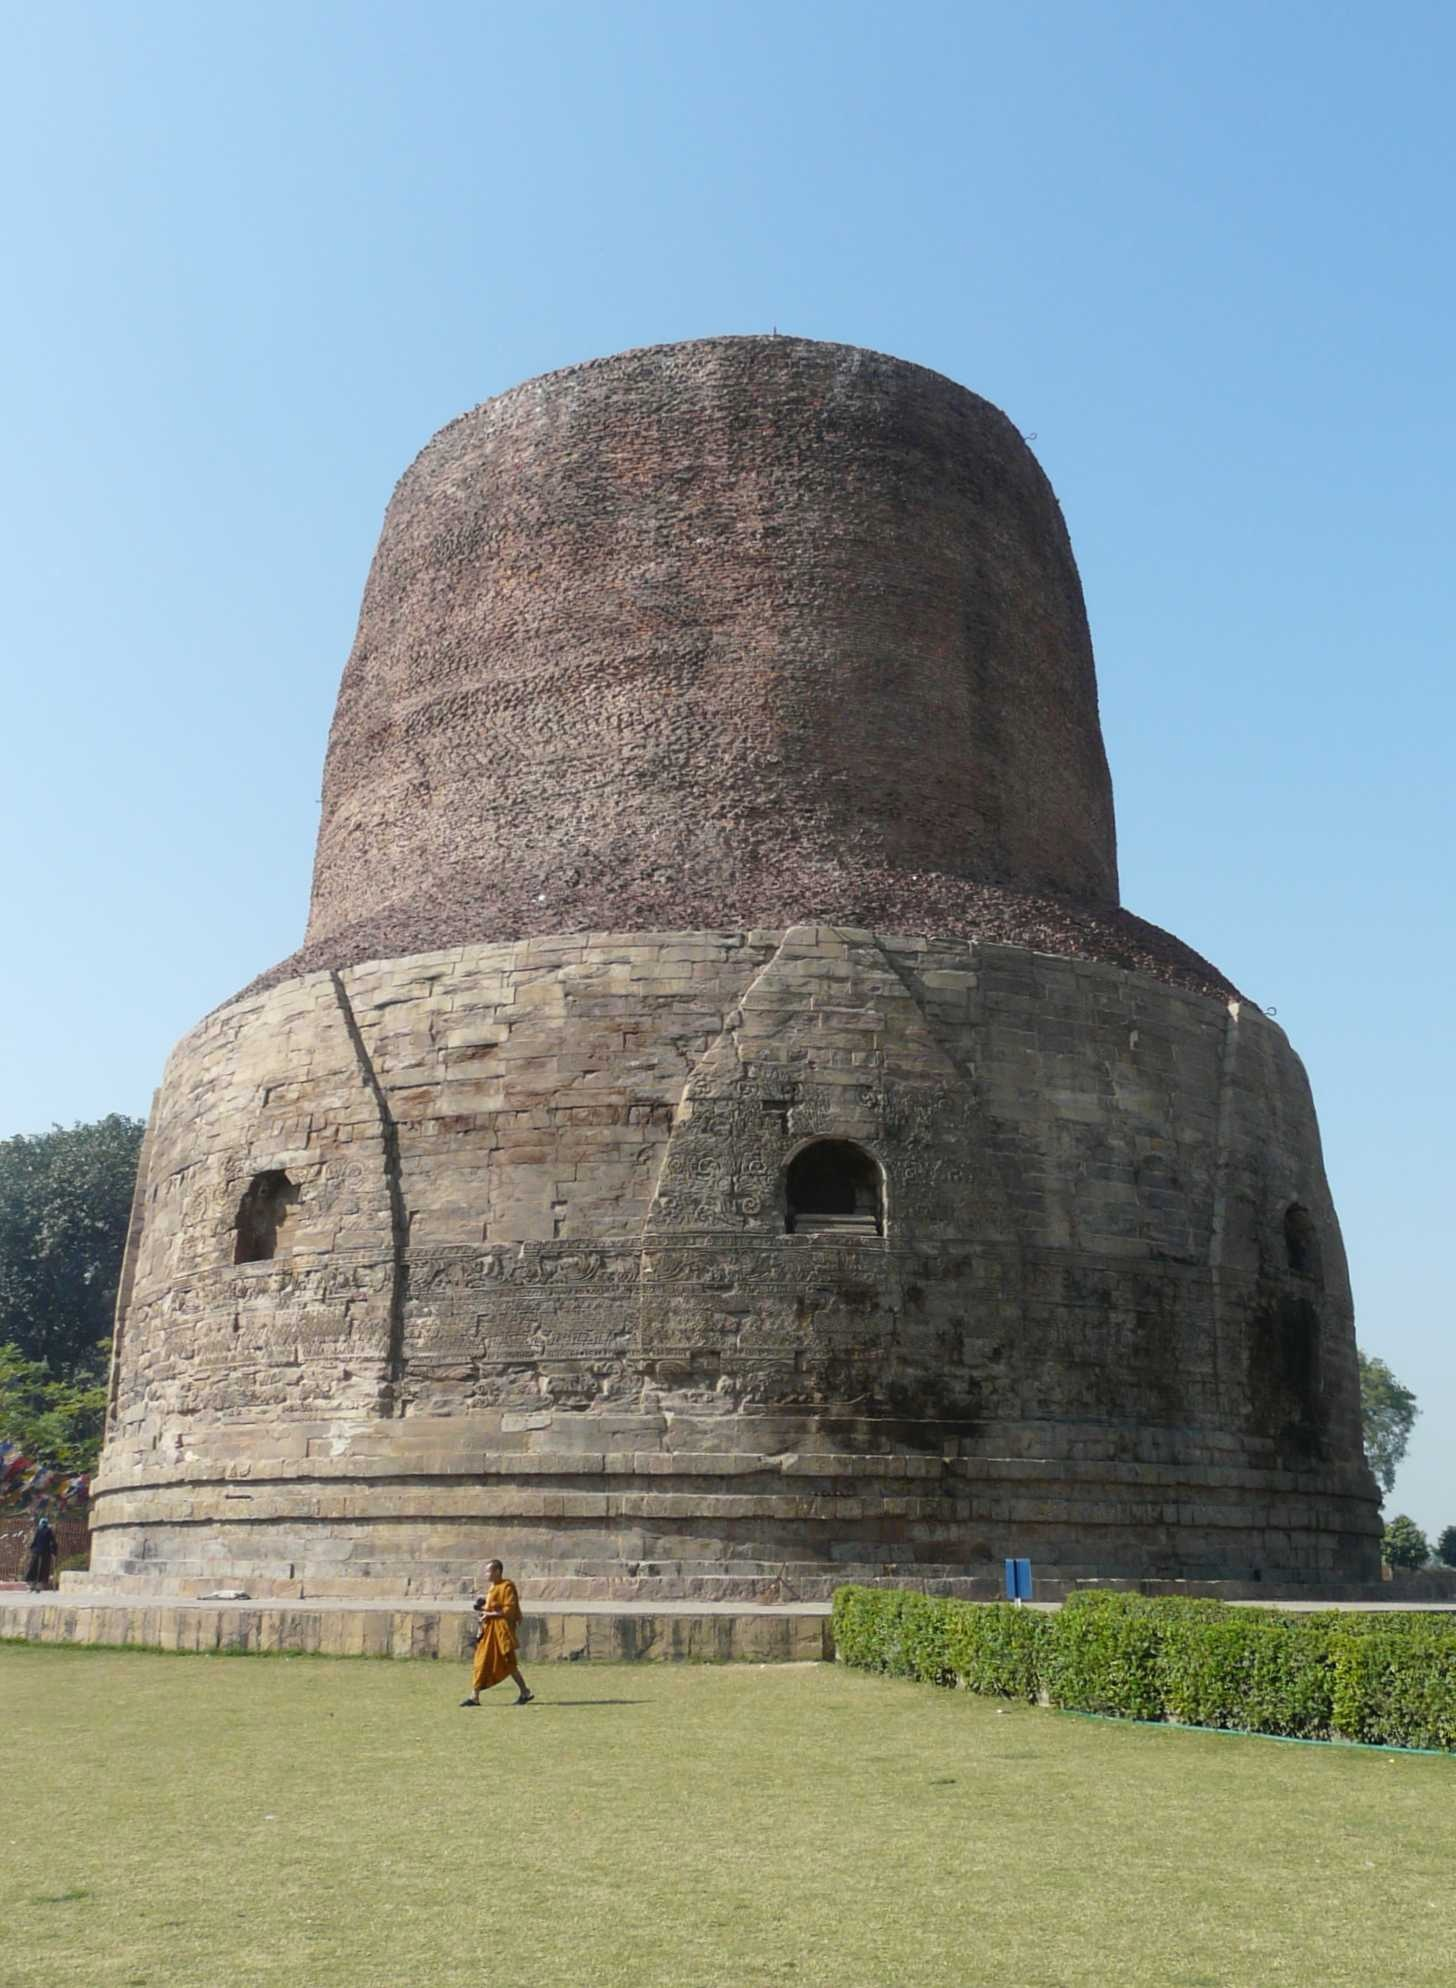 File:Dhamek stupa, Sarnath.jpg - Wikimedia Commons